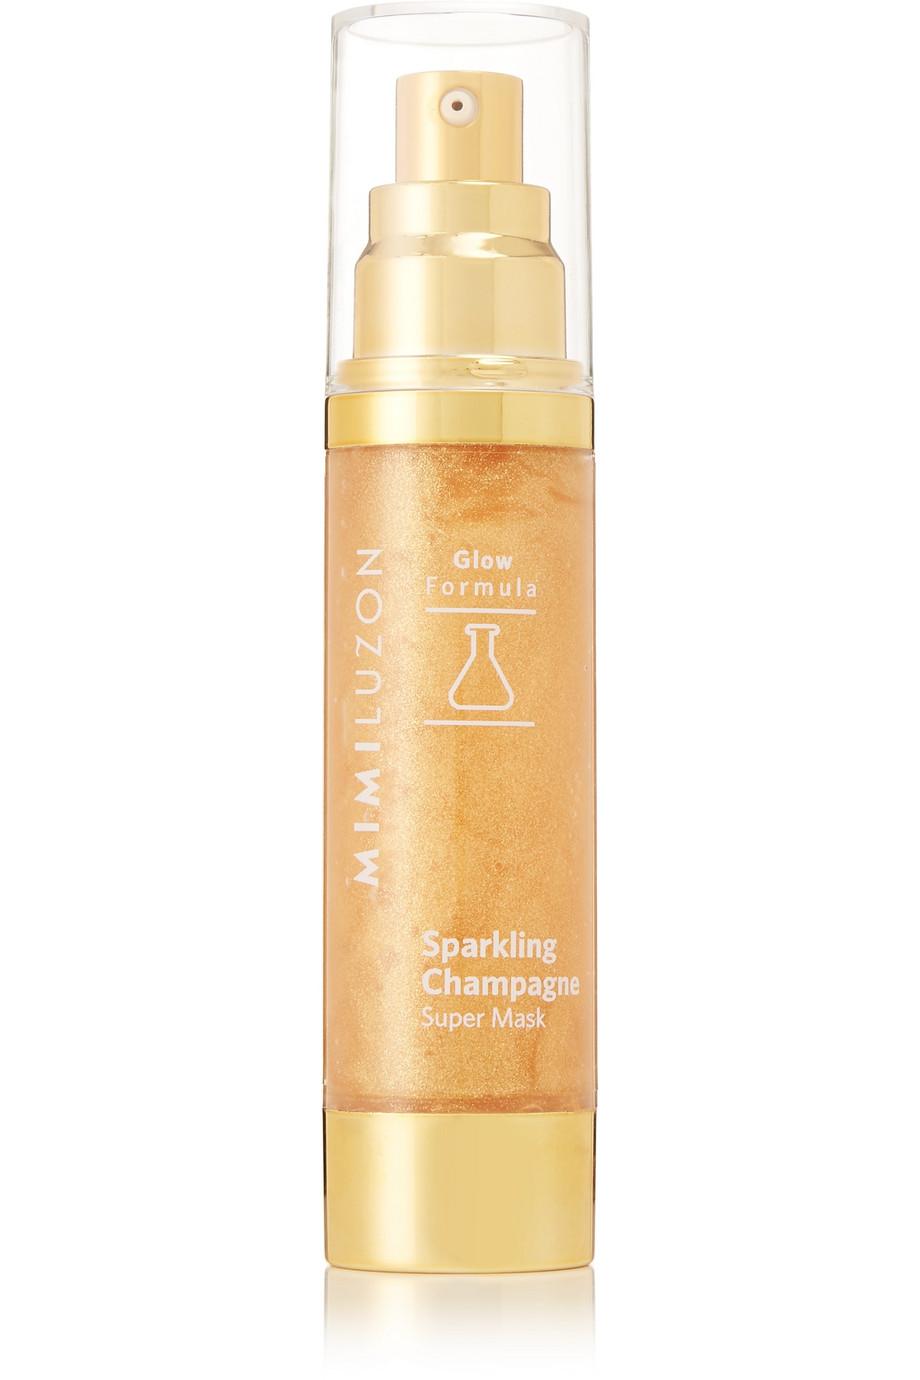 Mimi Luzon Sparkling Champagne Super Mask, 50 ml – Gesichtsmaske